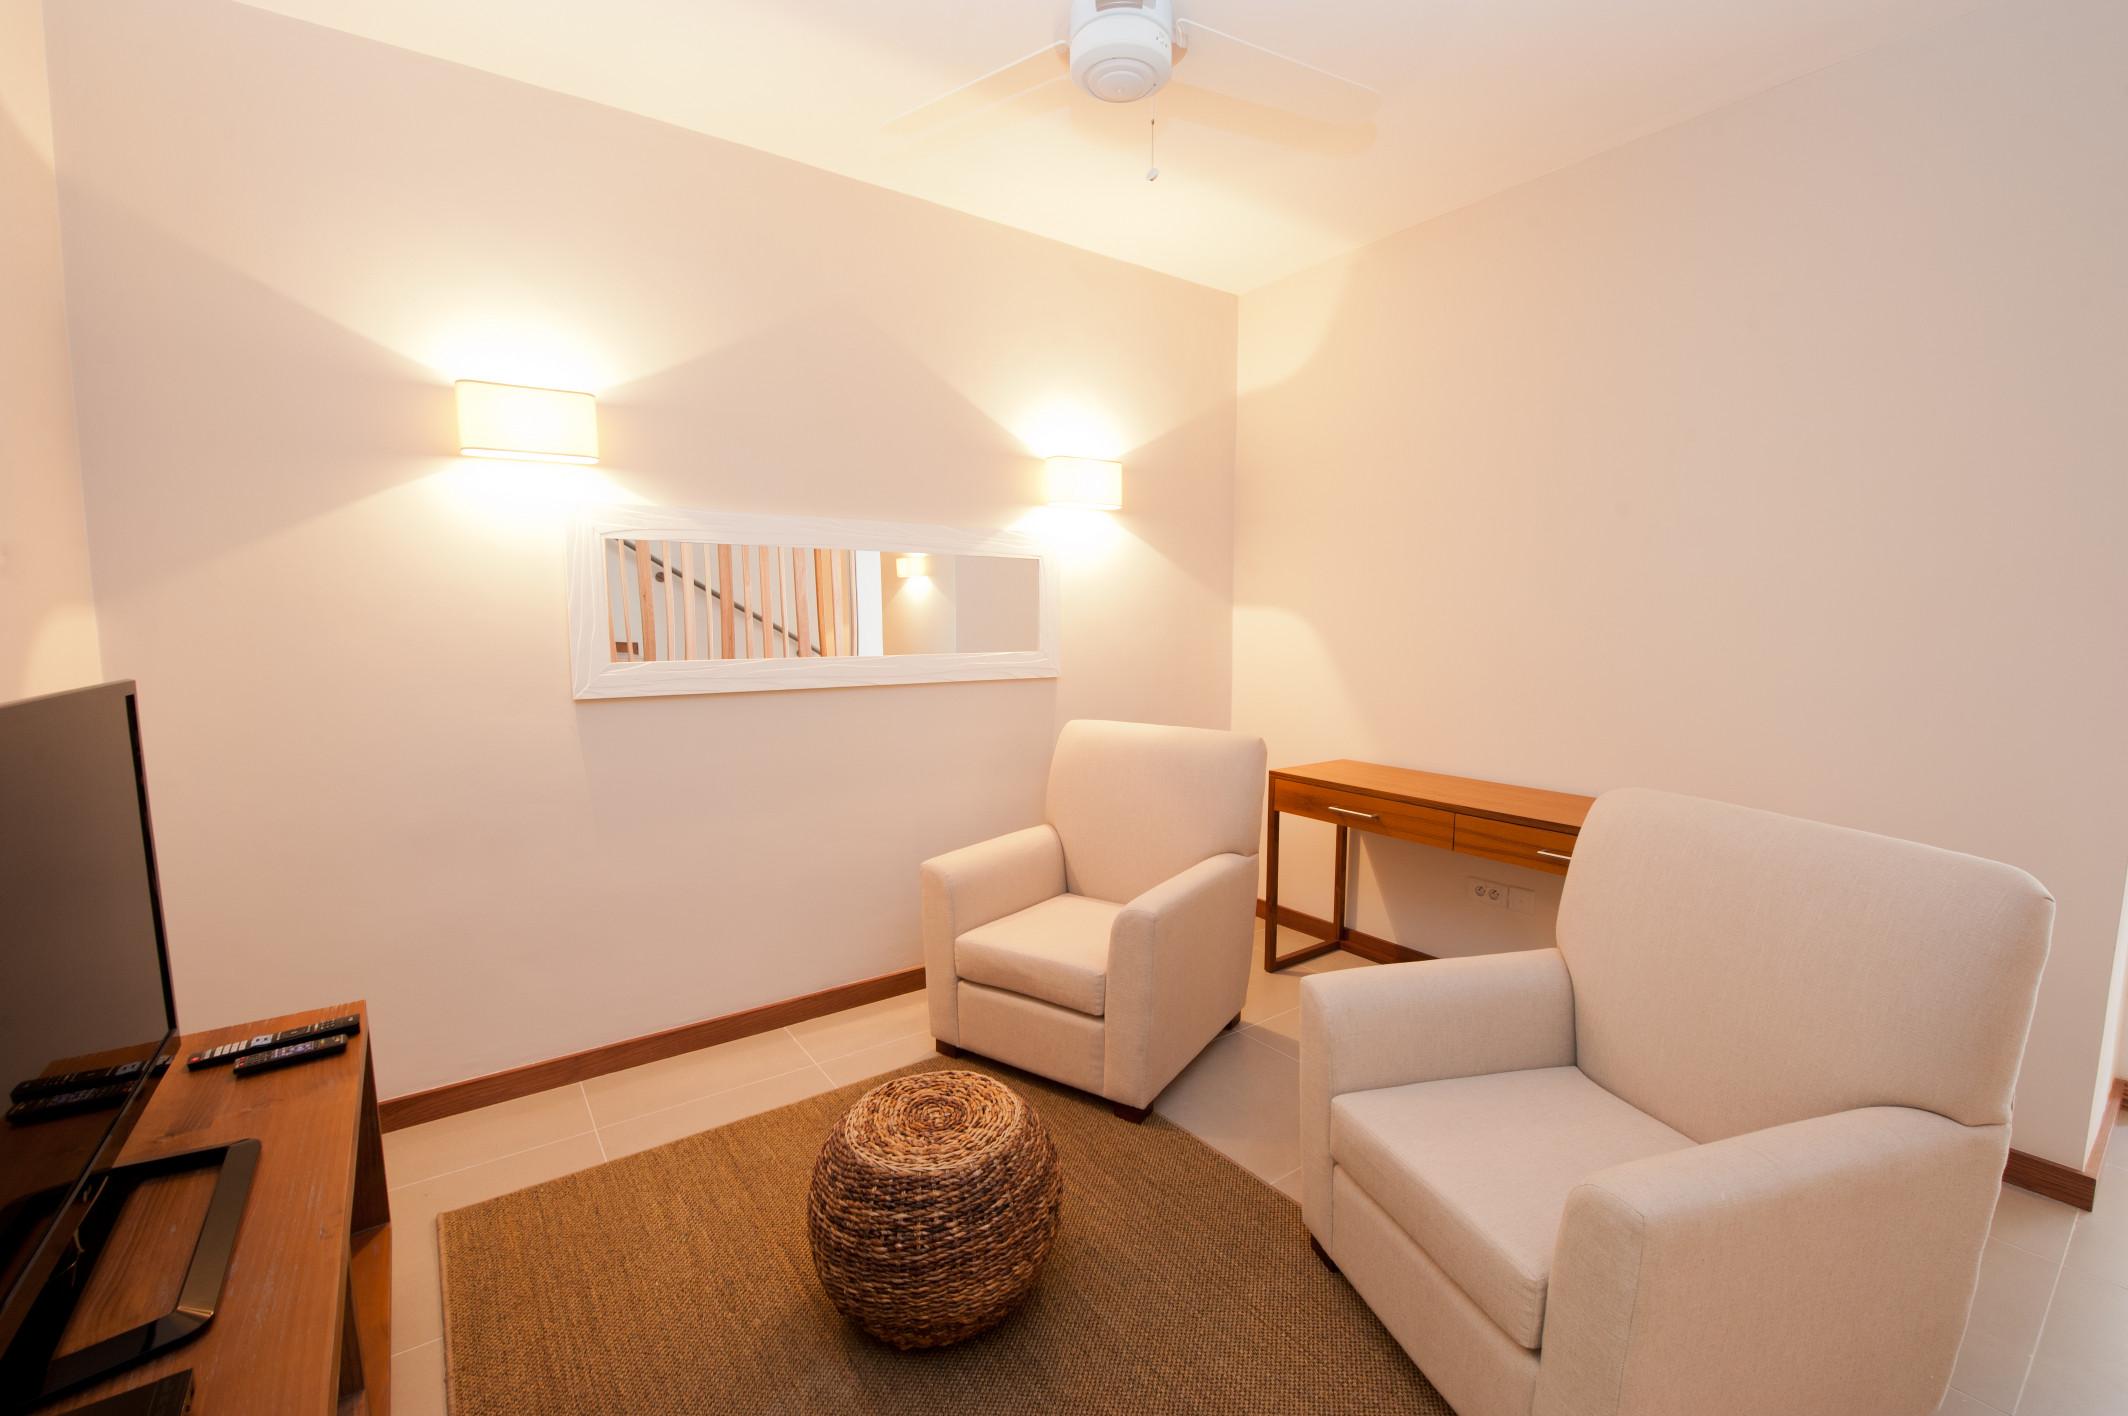 La Residence - Triplex - Study Room.jpg